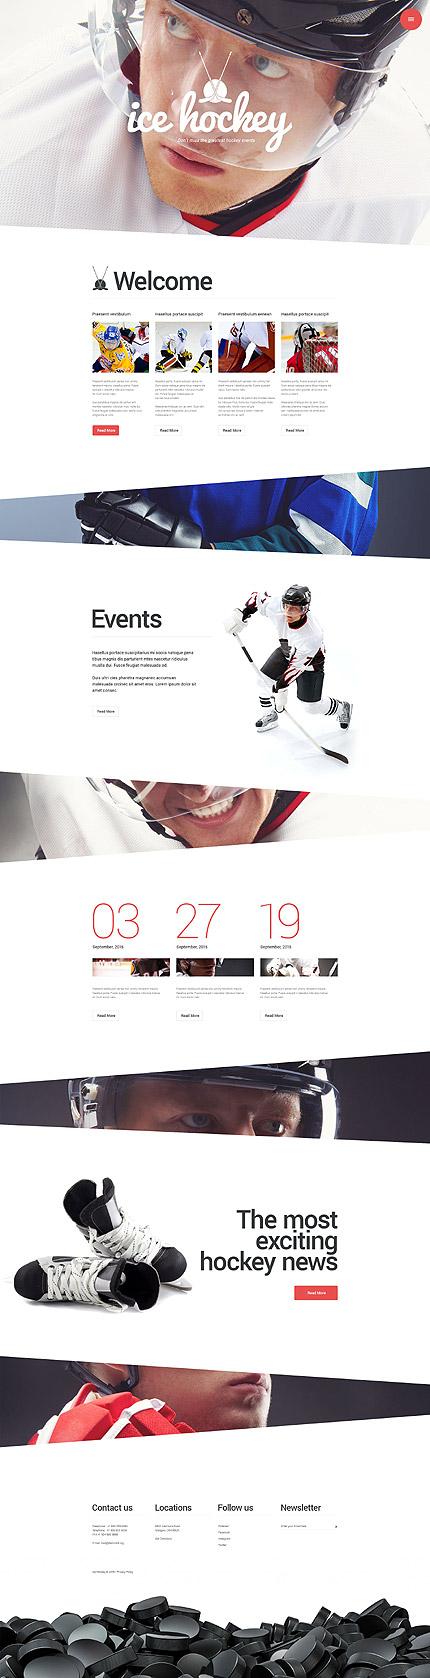 Hockey WordPress Theme eenvoudige wordpress templates